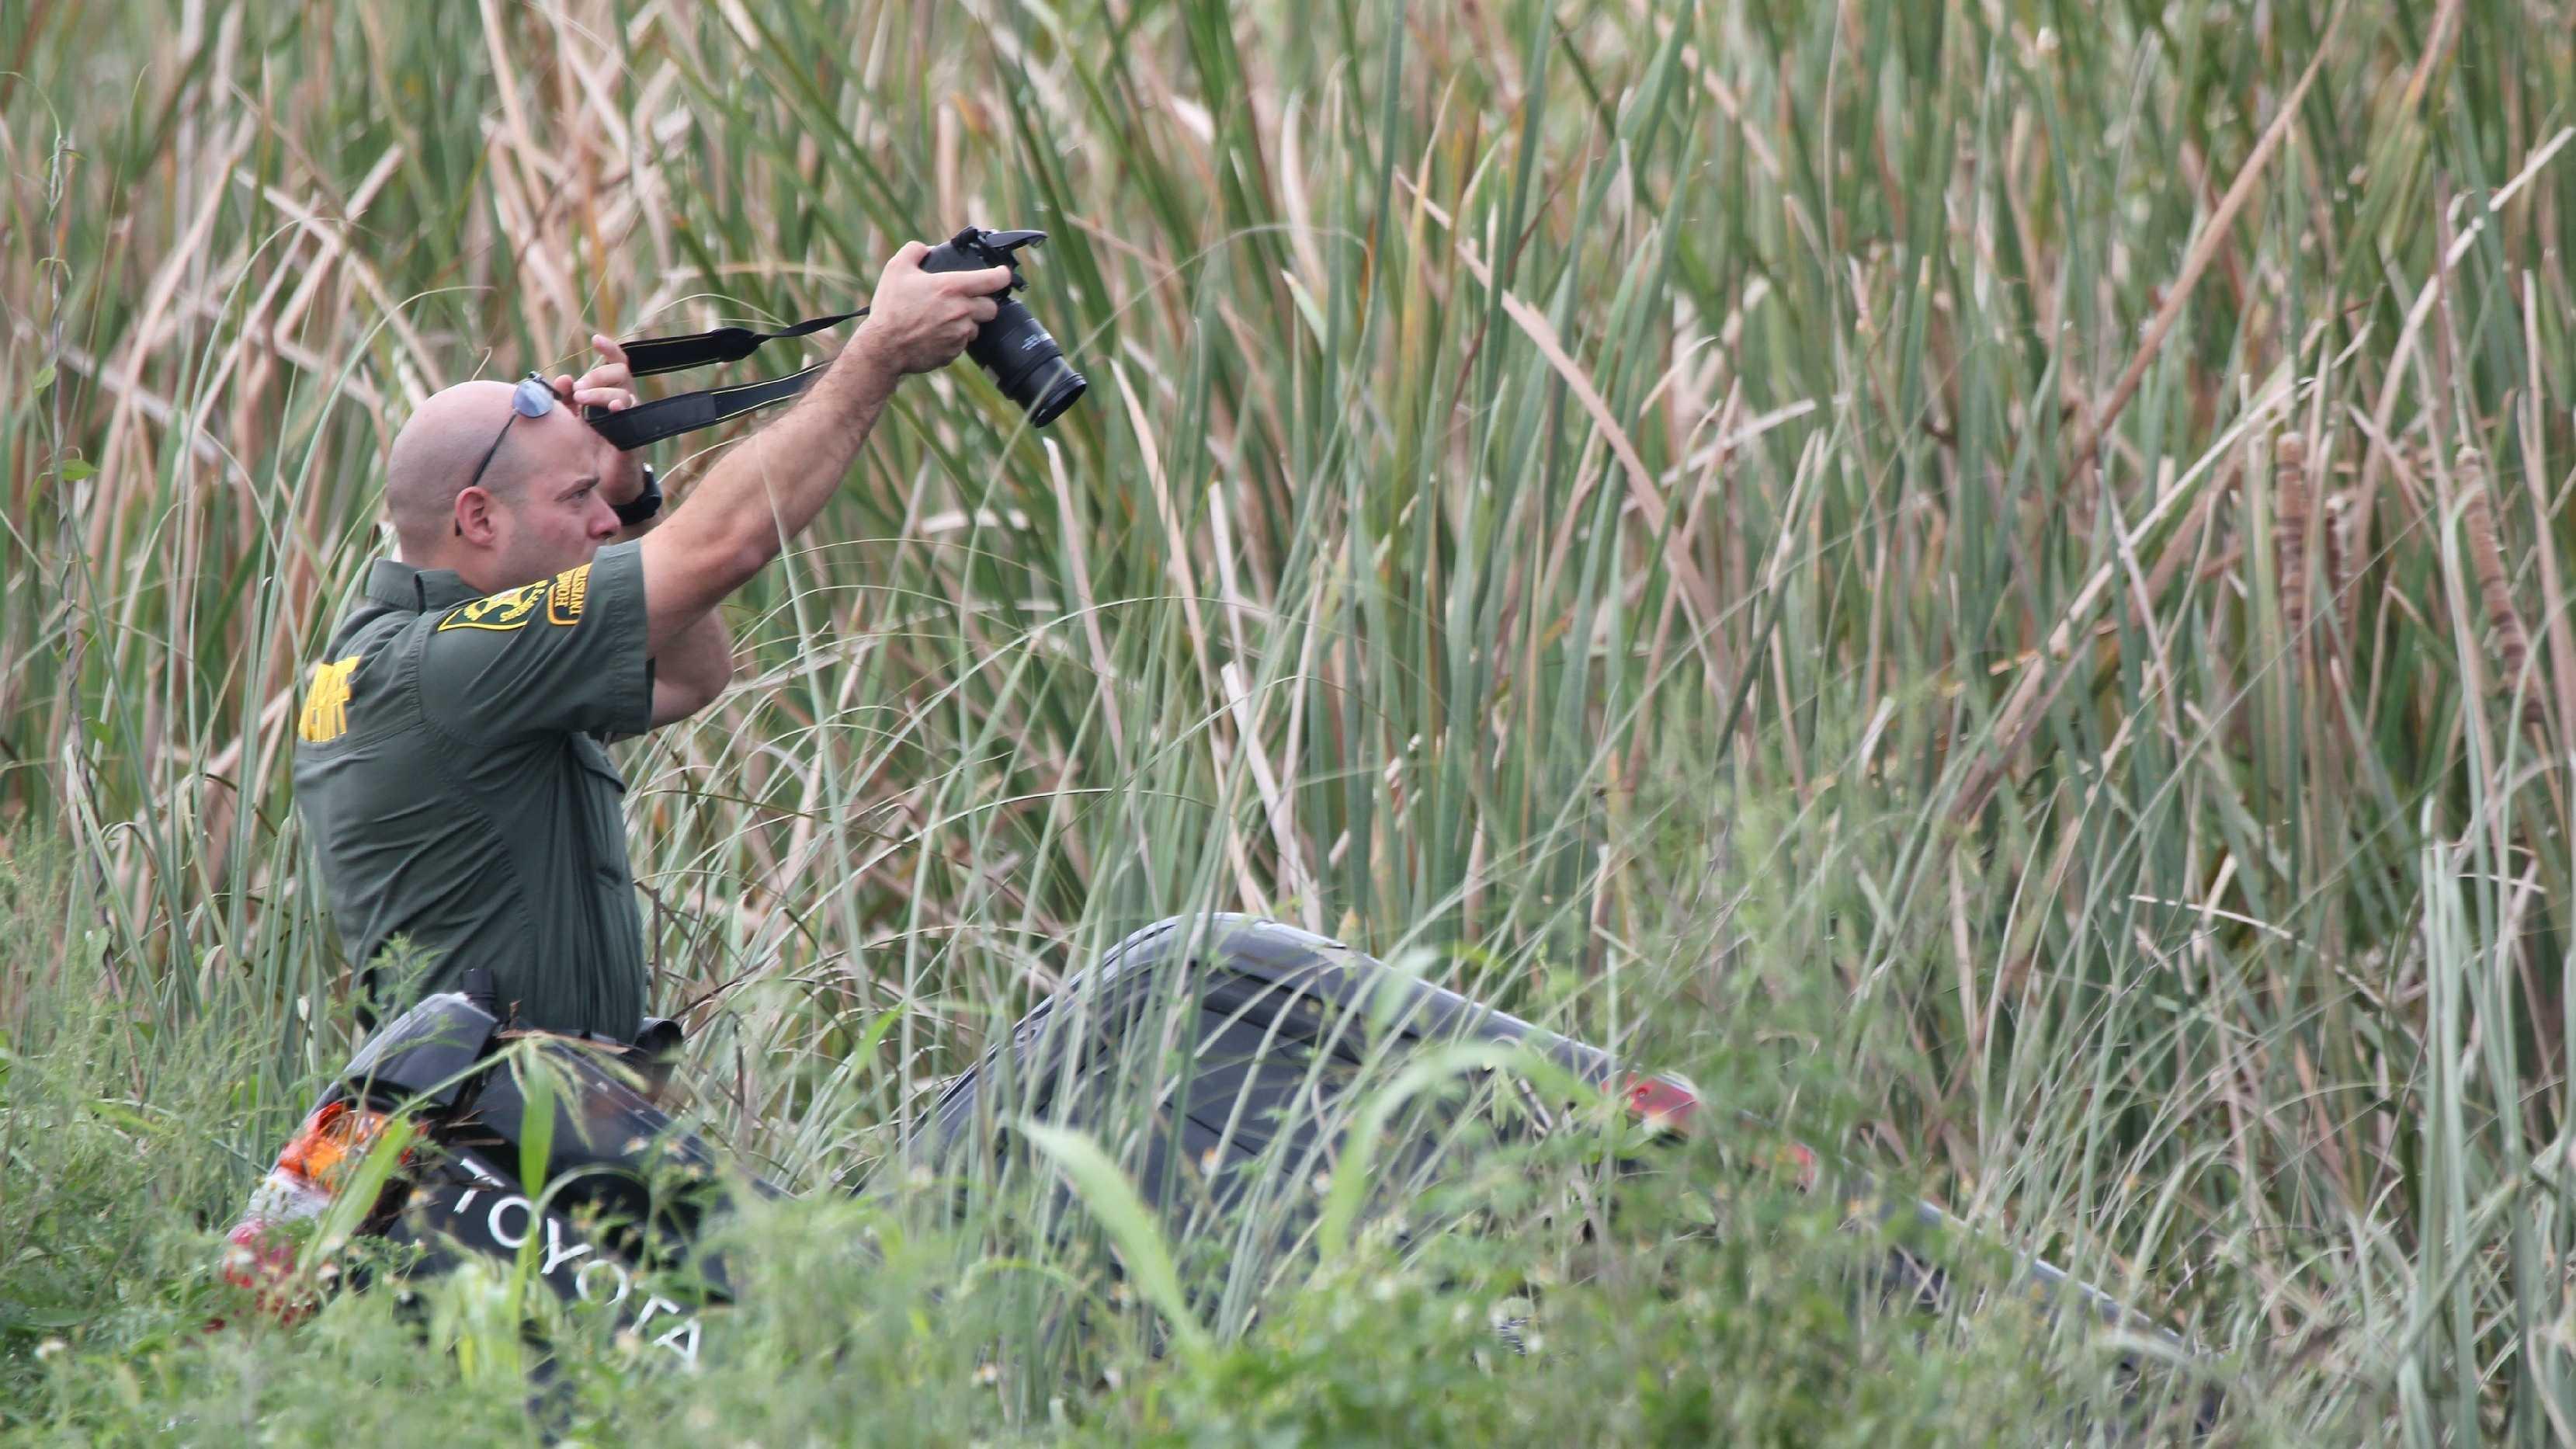 Teen killed in Everglades crash scene